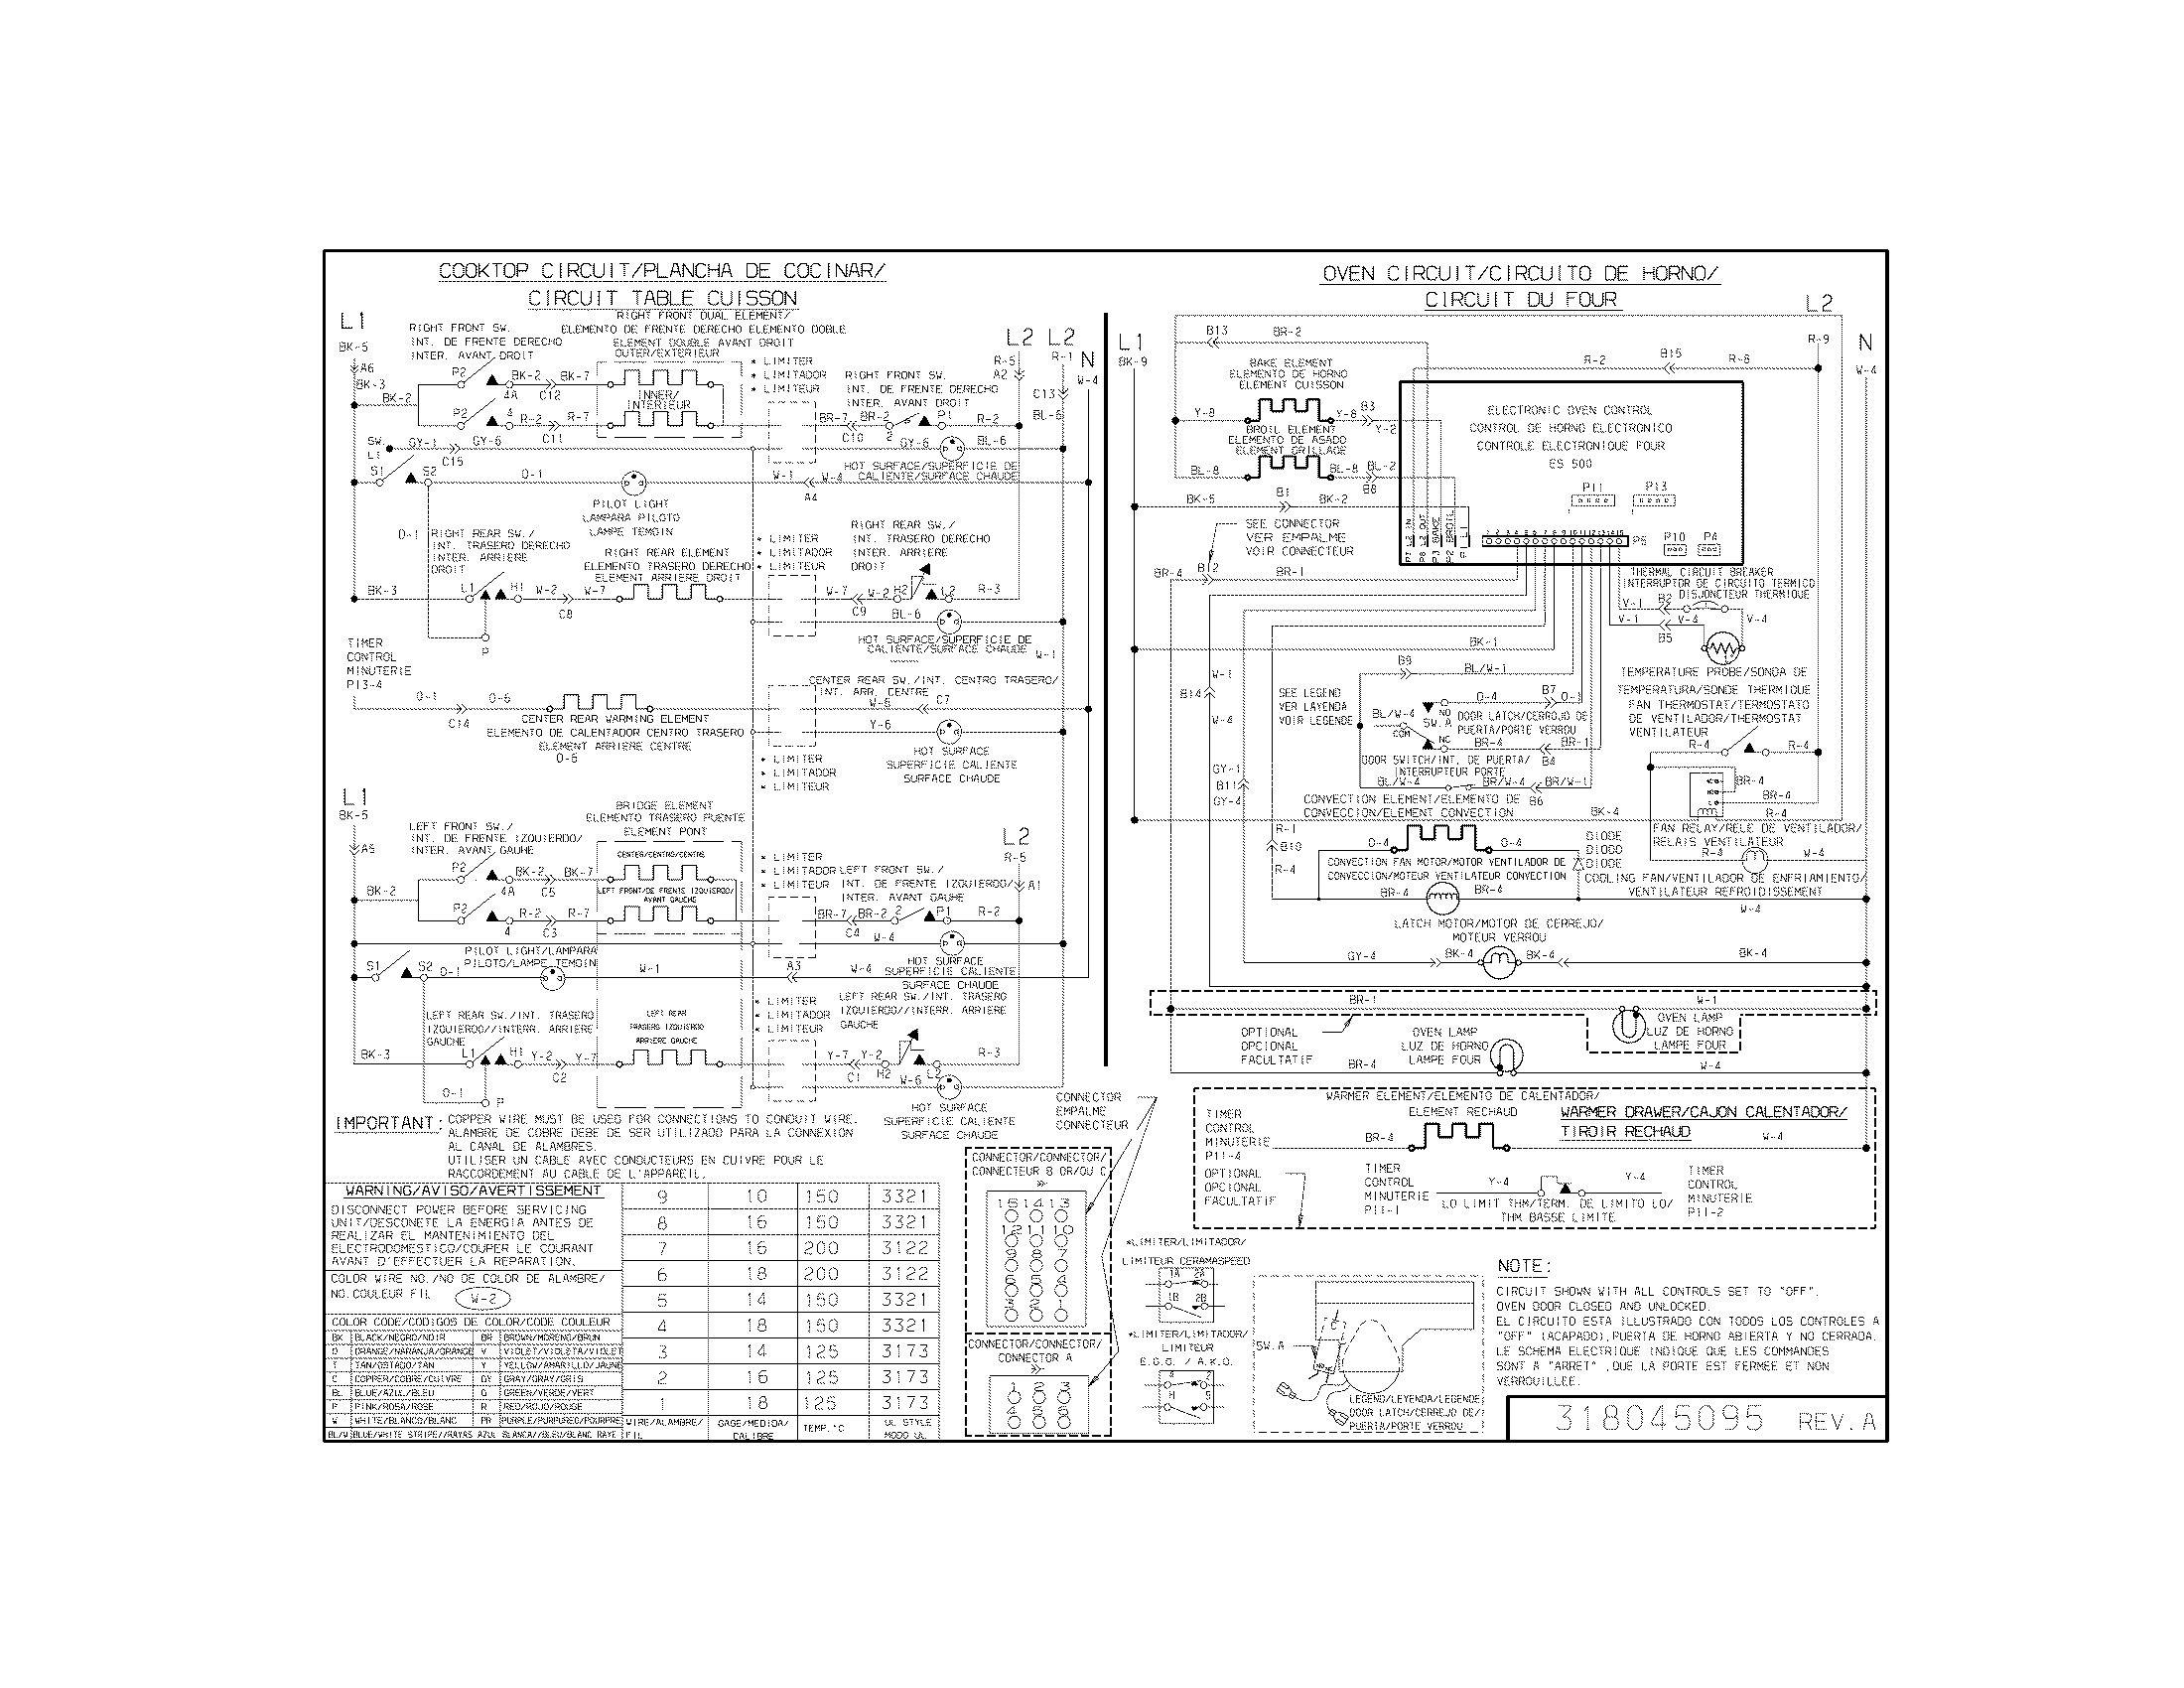 Lace Wiring Diagram 19 Images Diagrams Sensor Humbucker Partsresize